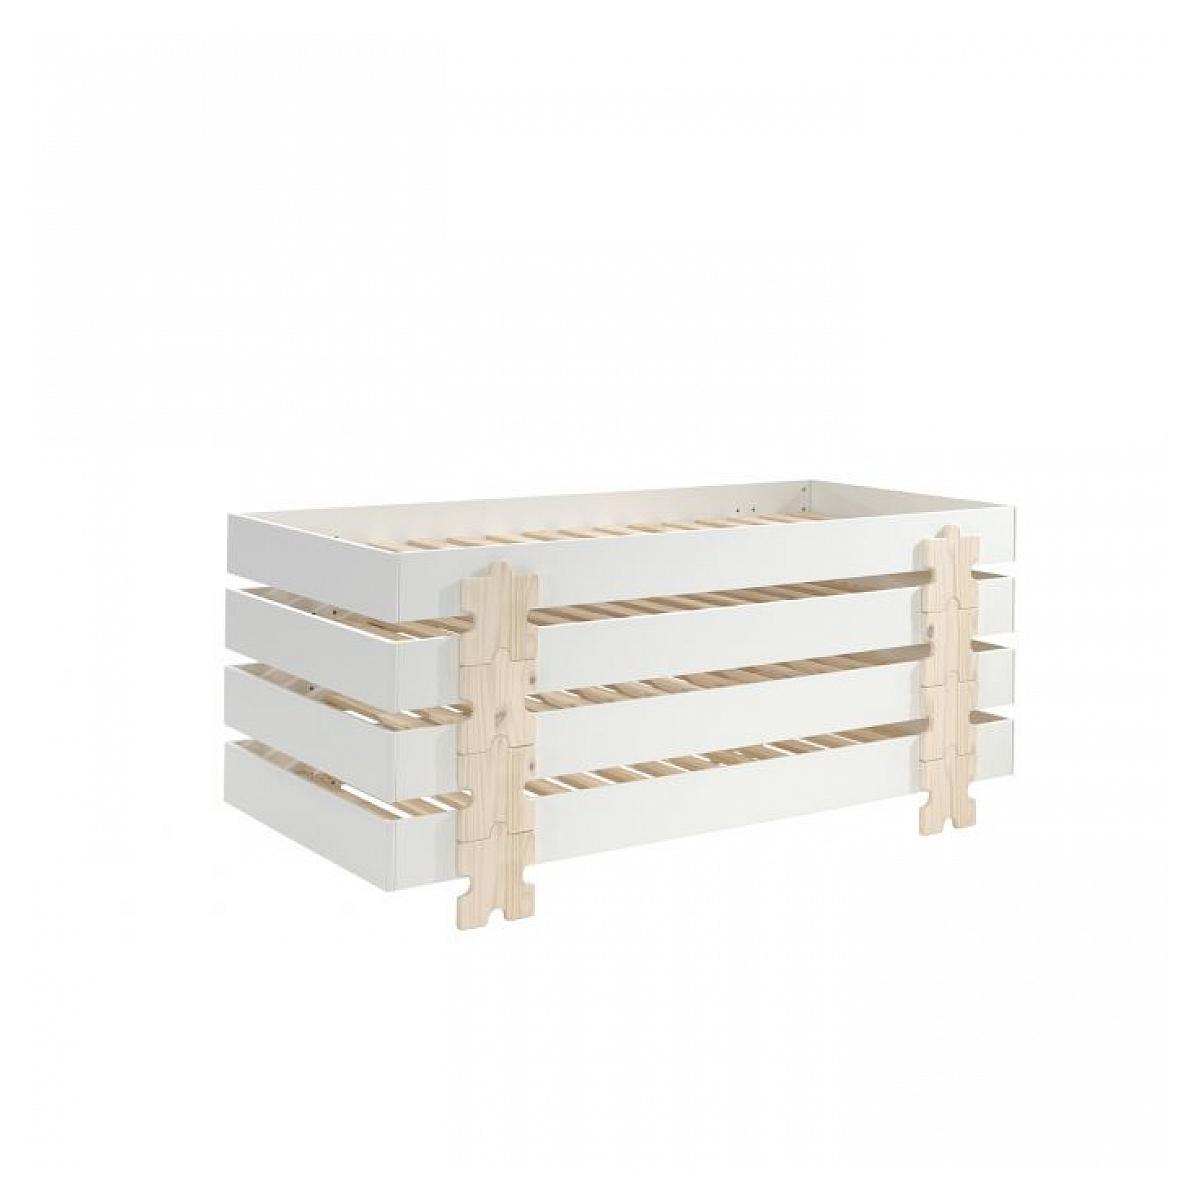 Vipack - 4 Lits Modulo Puzzle Blancs Empilables 90x200 L 203,6 x Lg 93,8